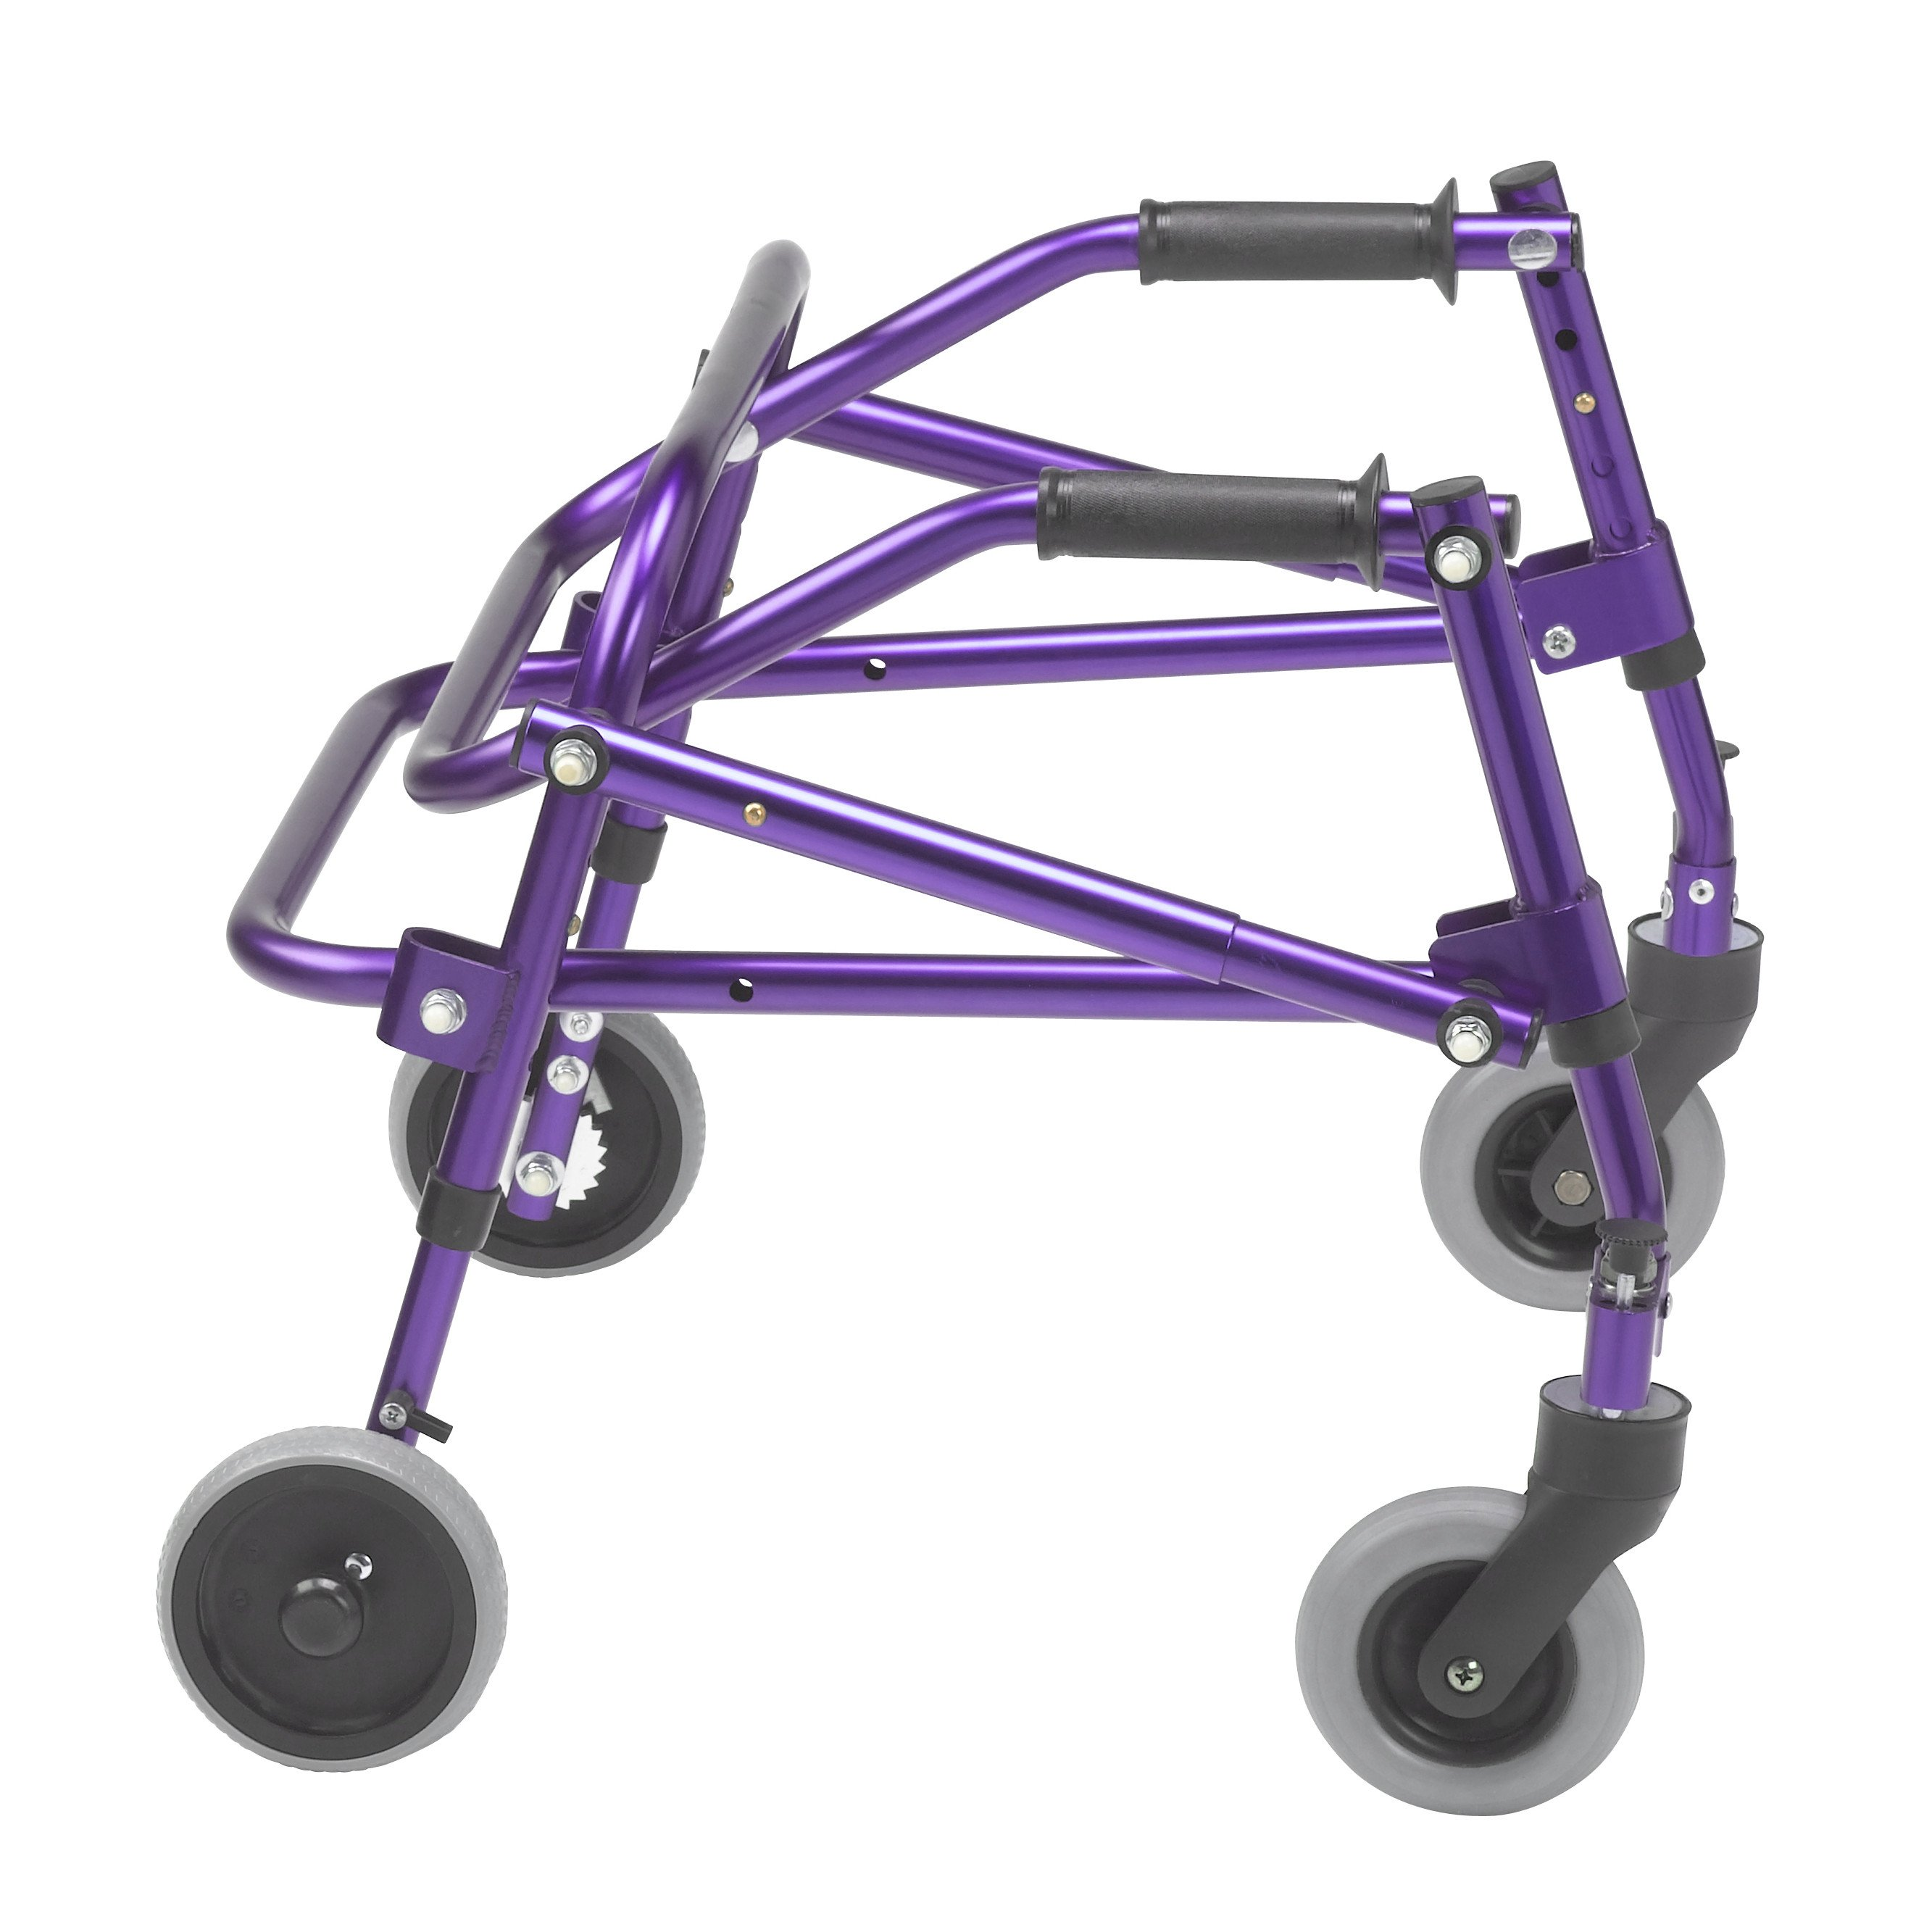 Nimbo 2G Lightweight Posterior Walker - Small - Wizard Purple - Side View